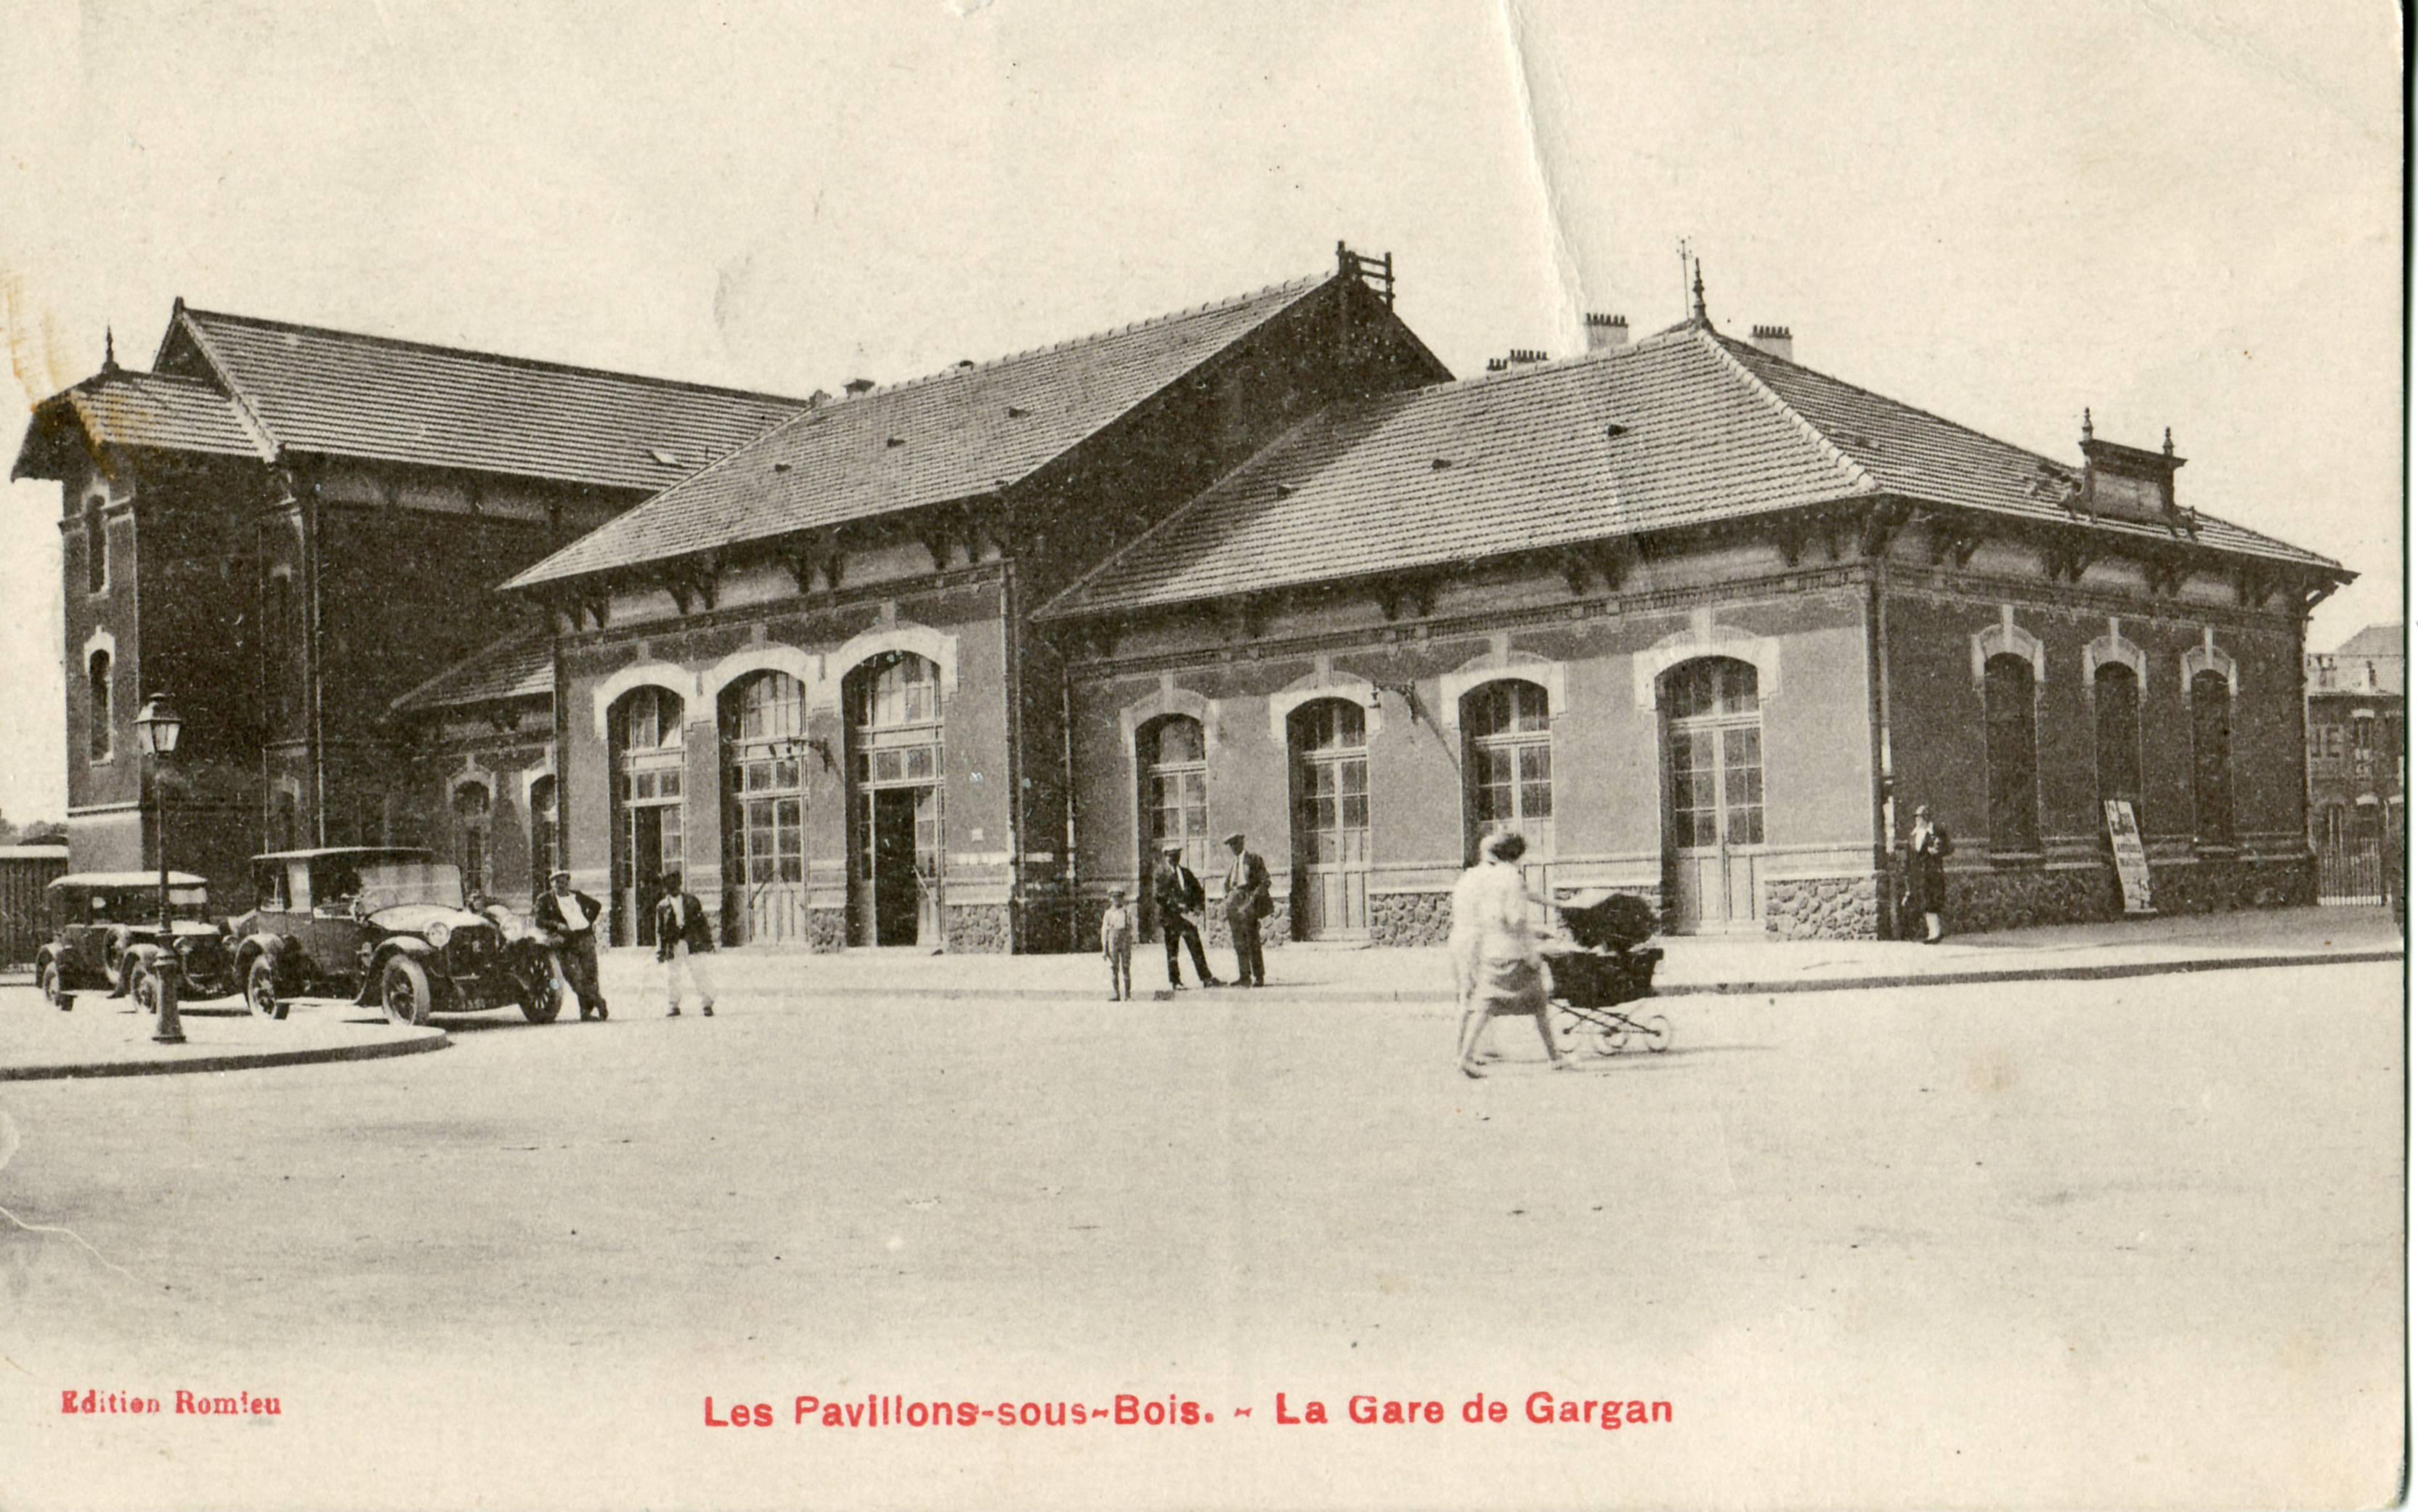 FileLes Pavillons sous Bois  La gare de GarganJPG